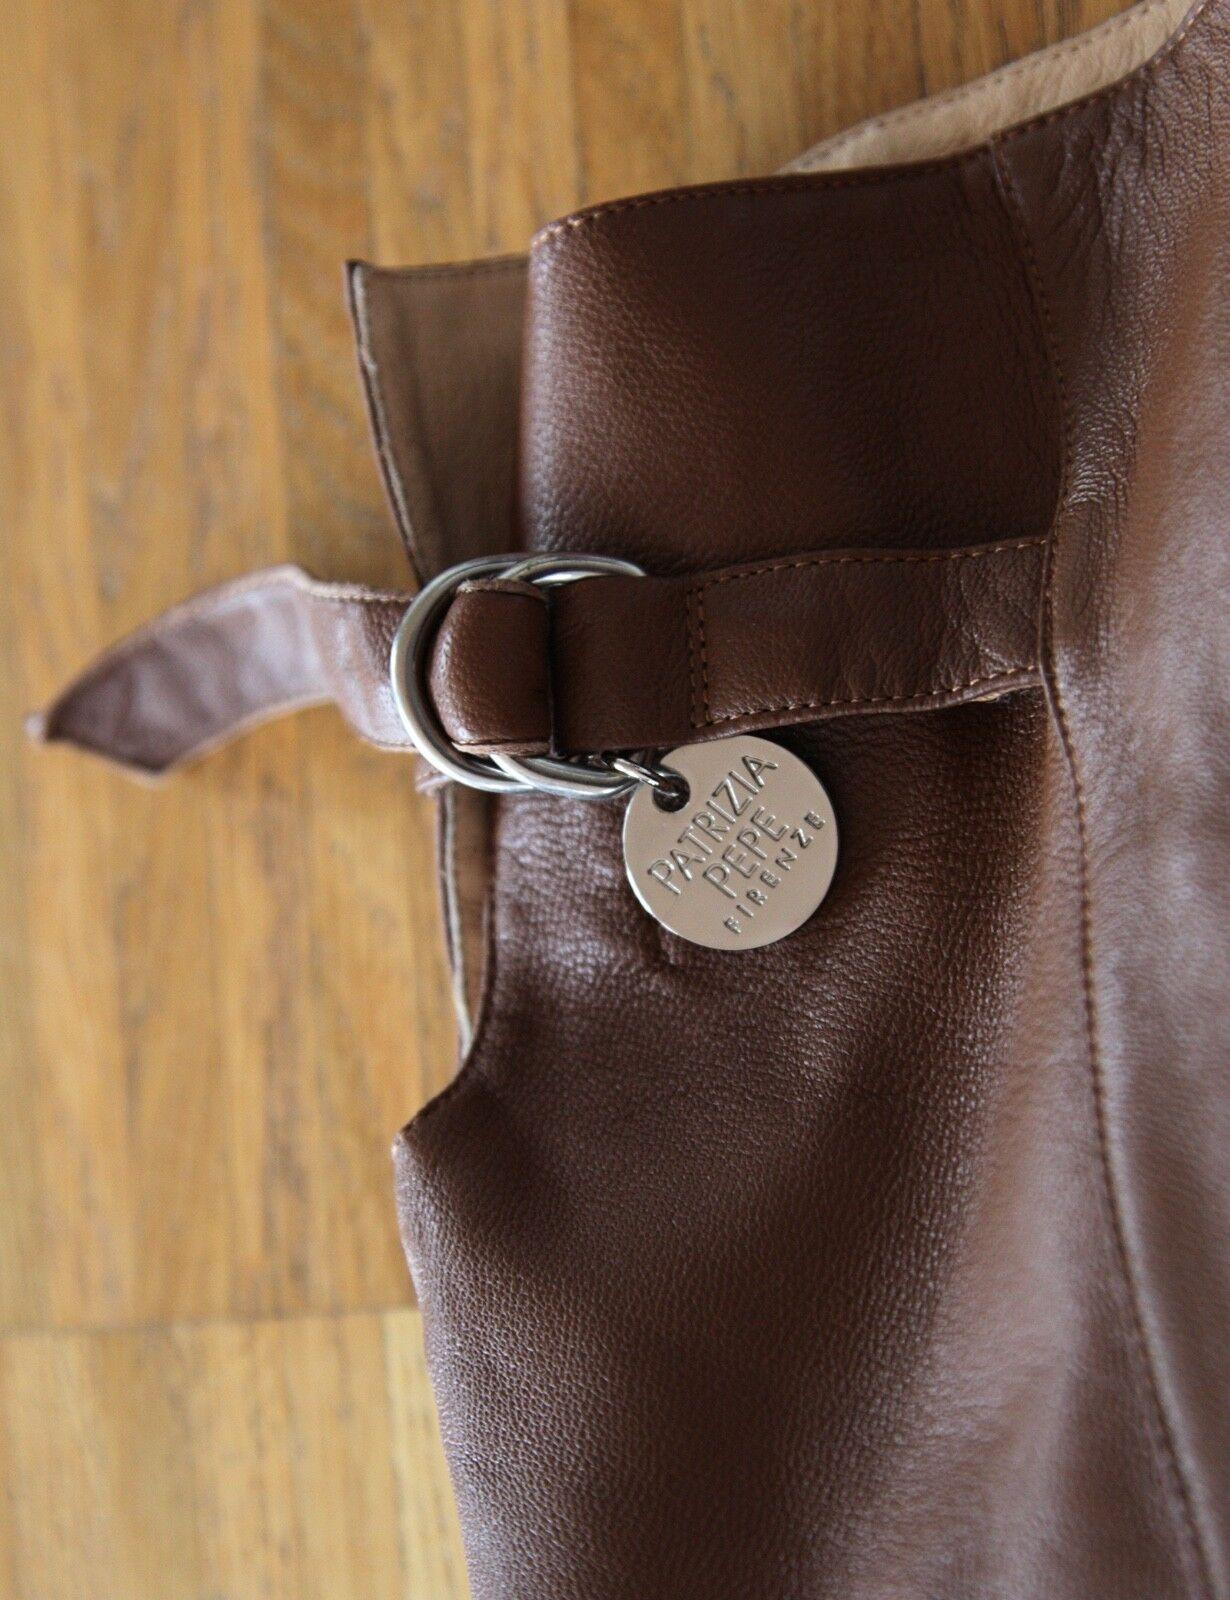 Patrizia Pepe Stiefel Overknees aus Leder Leder Leder Braun Gr. 40   bd9488